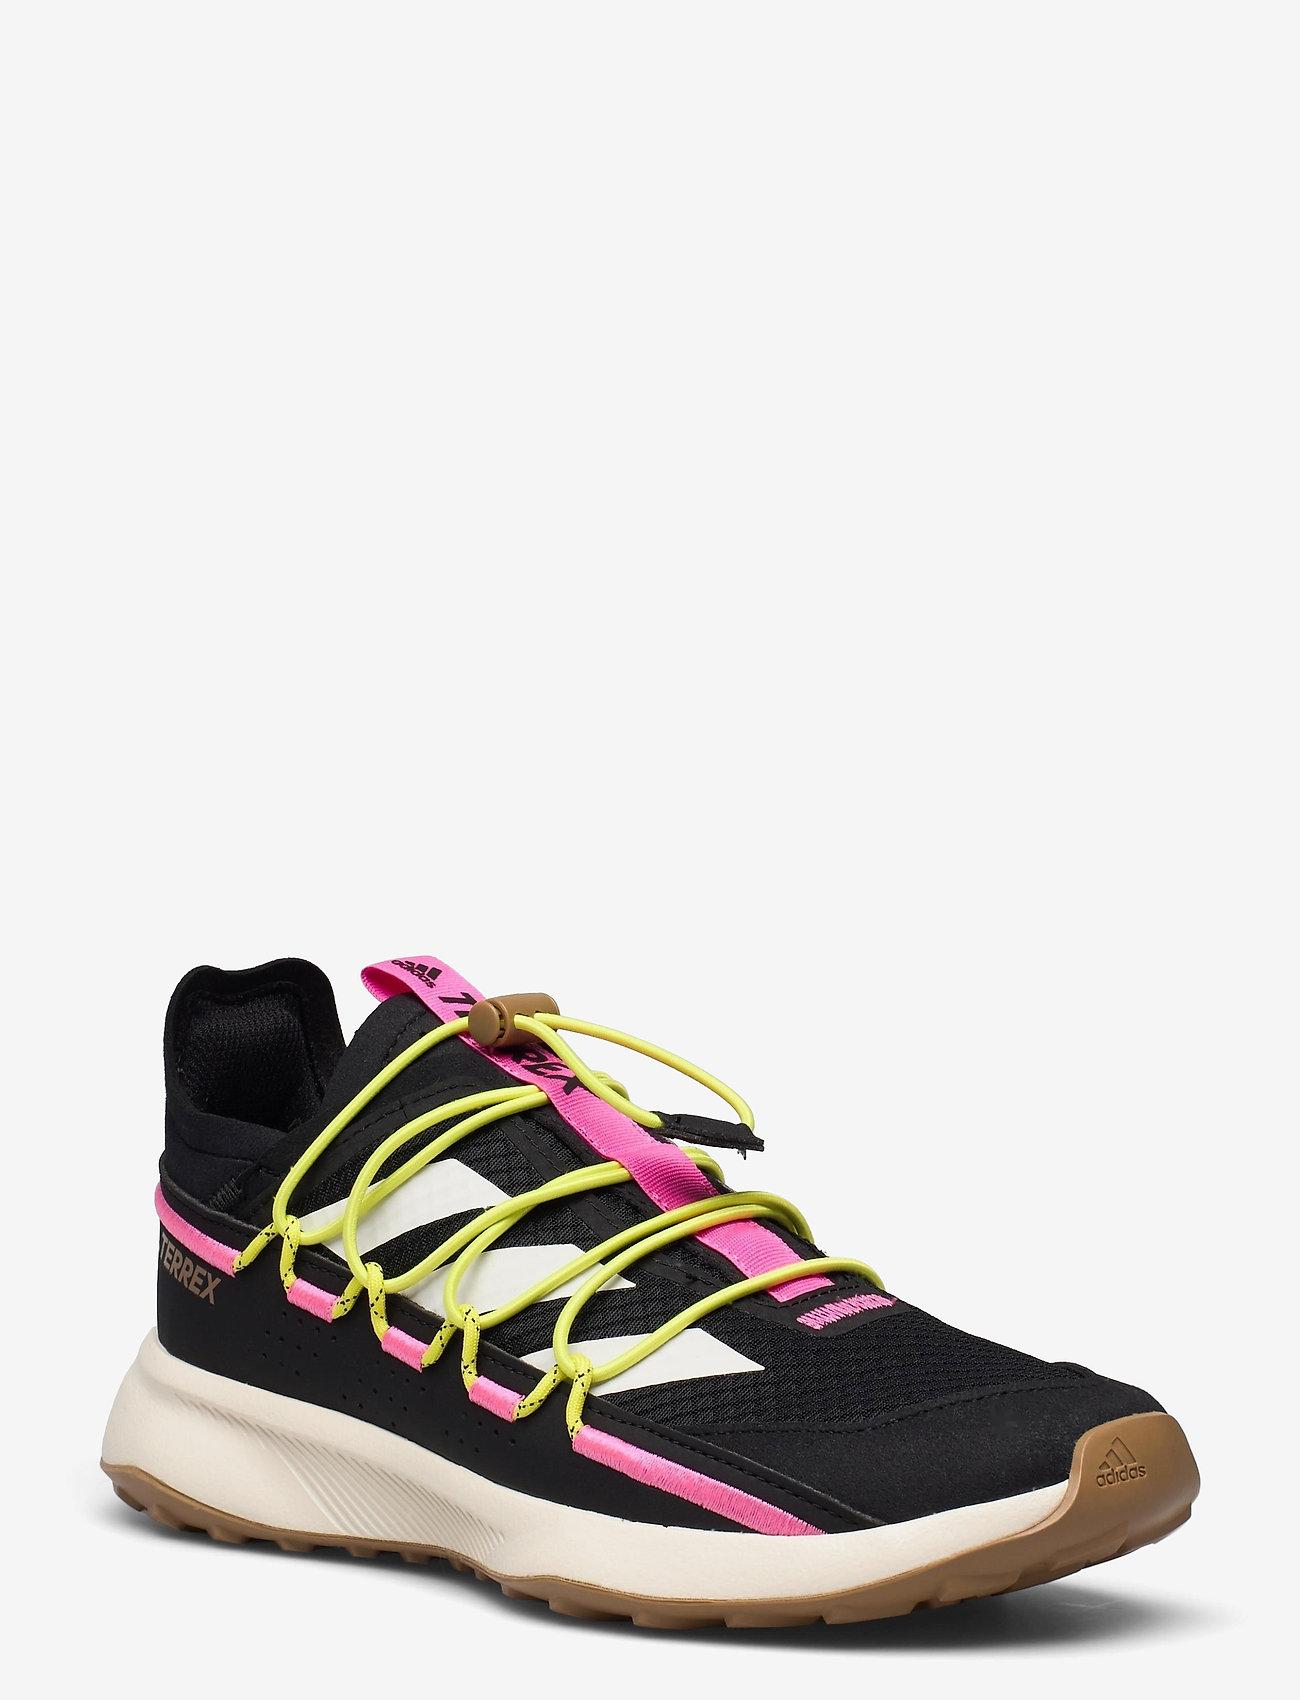 adidas Performance - Terrex Voyager 21 Travel  W - running shoes - cblack/cwhite/scrpnk - 1